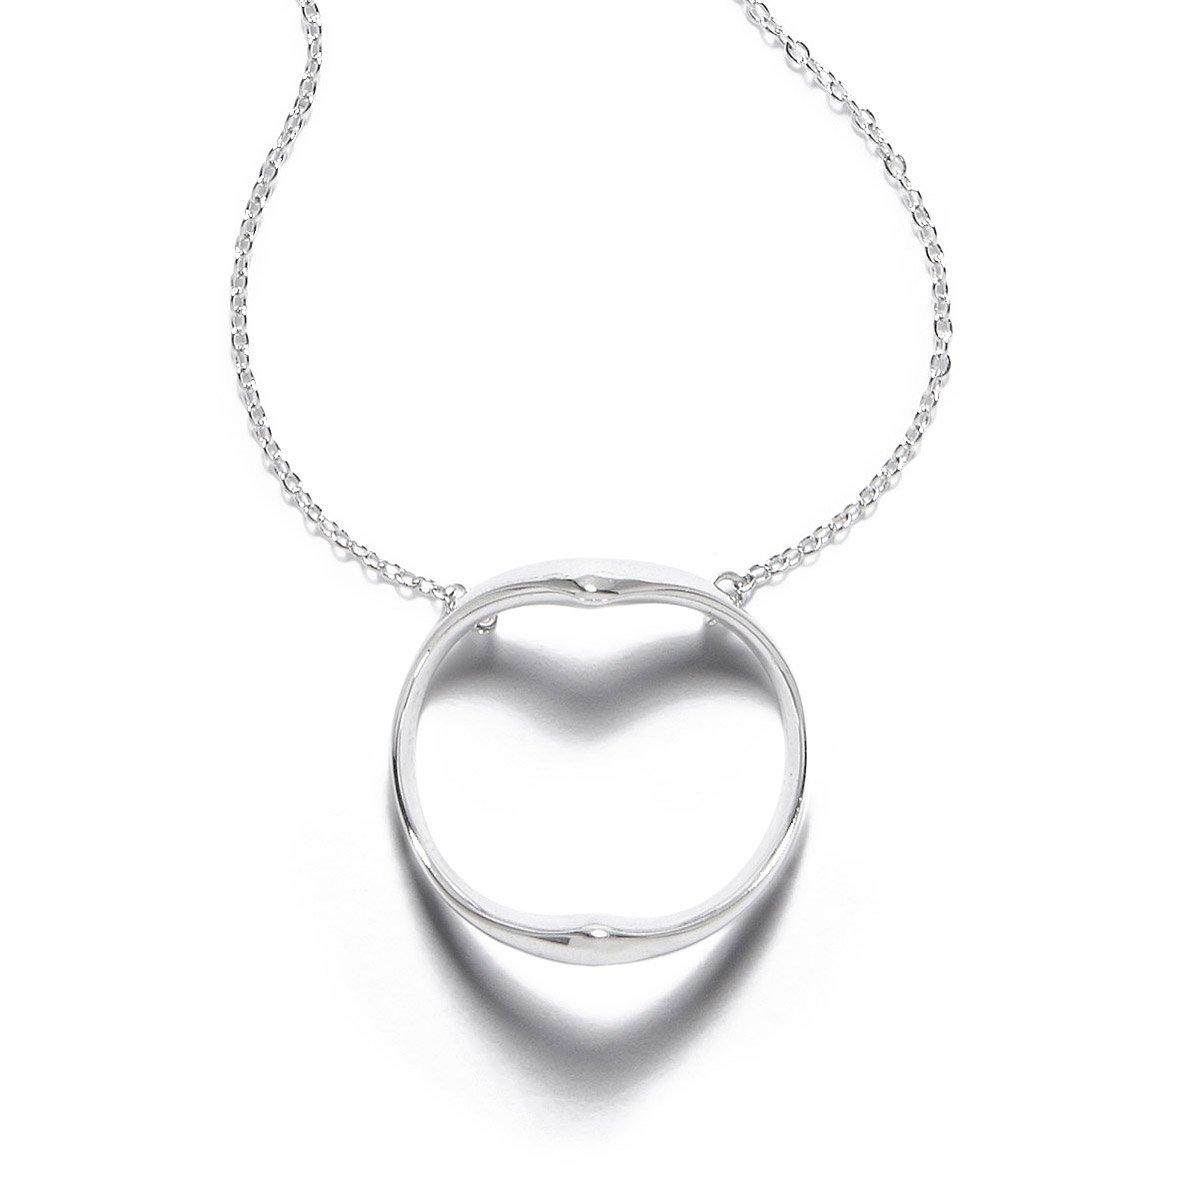 Shadow heart necklace hidden symbol jewelry uncommongoods shadow heart necklace 1 thumbnail aloadofball Gallery